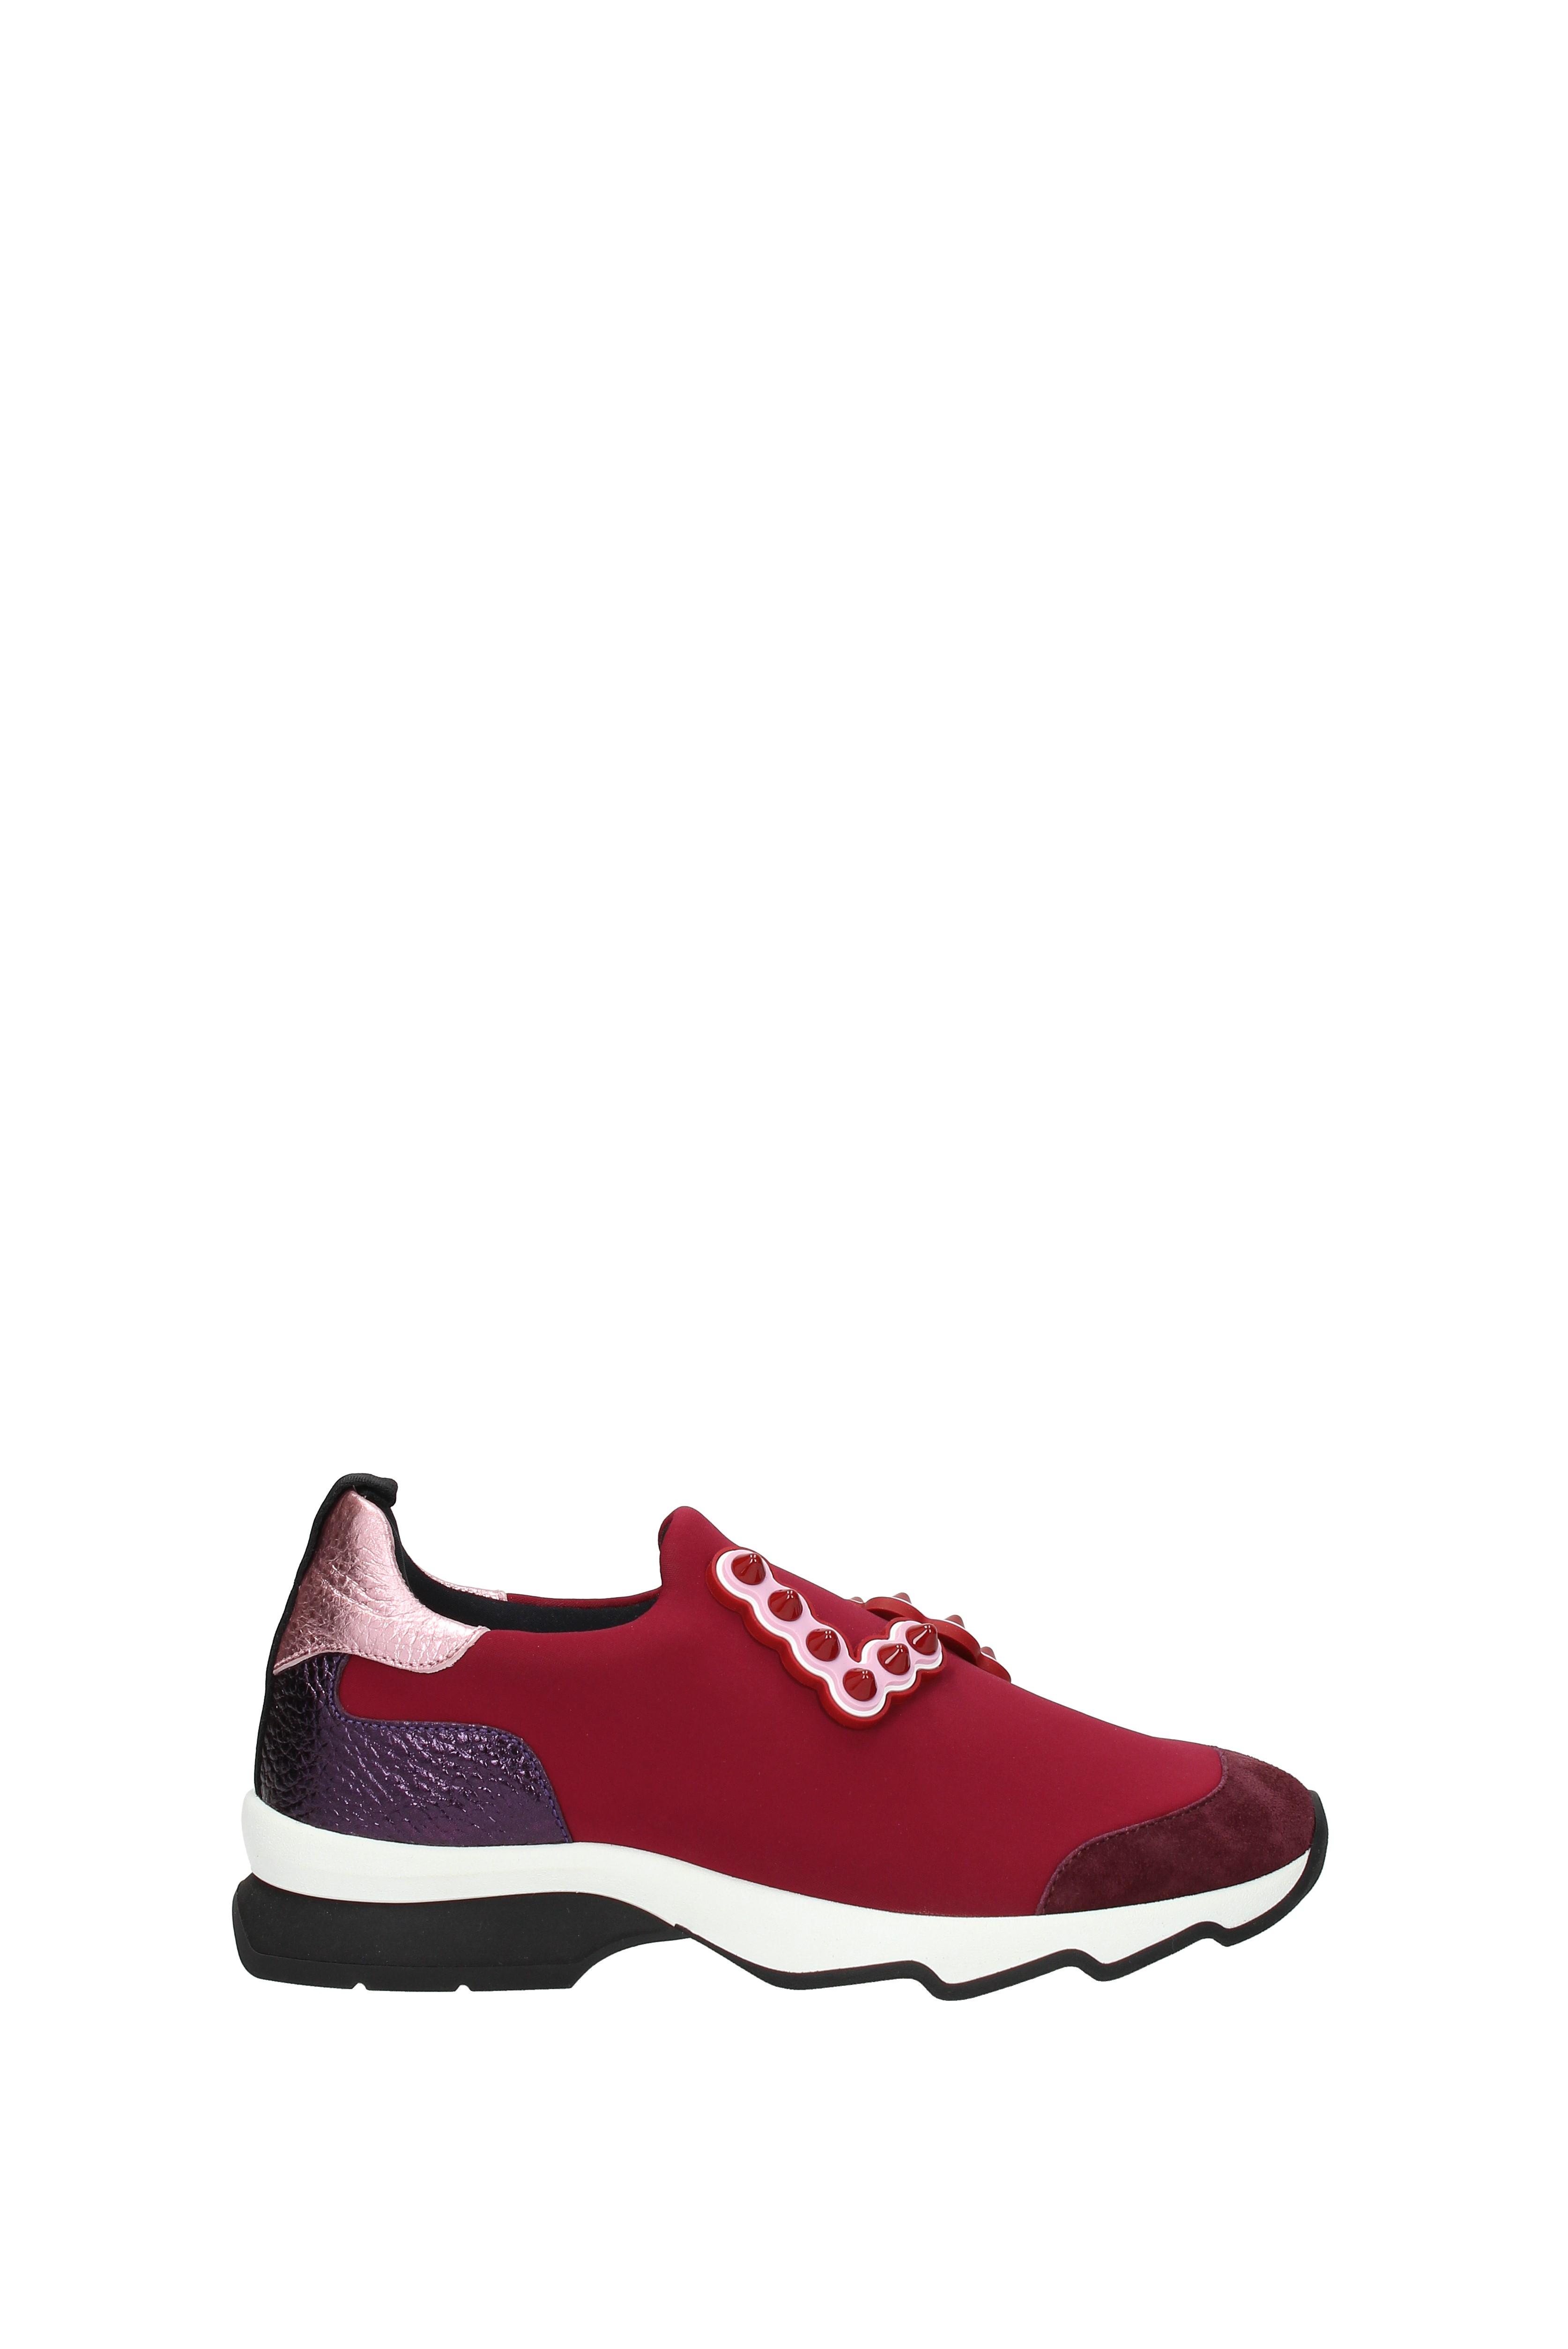 Sneakers Fendi Damen - Stoff (8E6698A16C) (8E6698A16C) (8E6698A16C) 2cdf1a